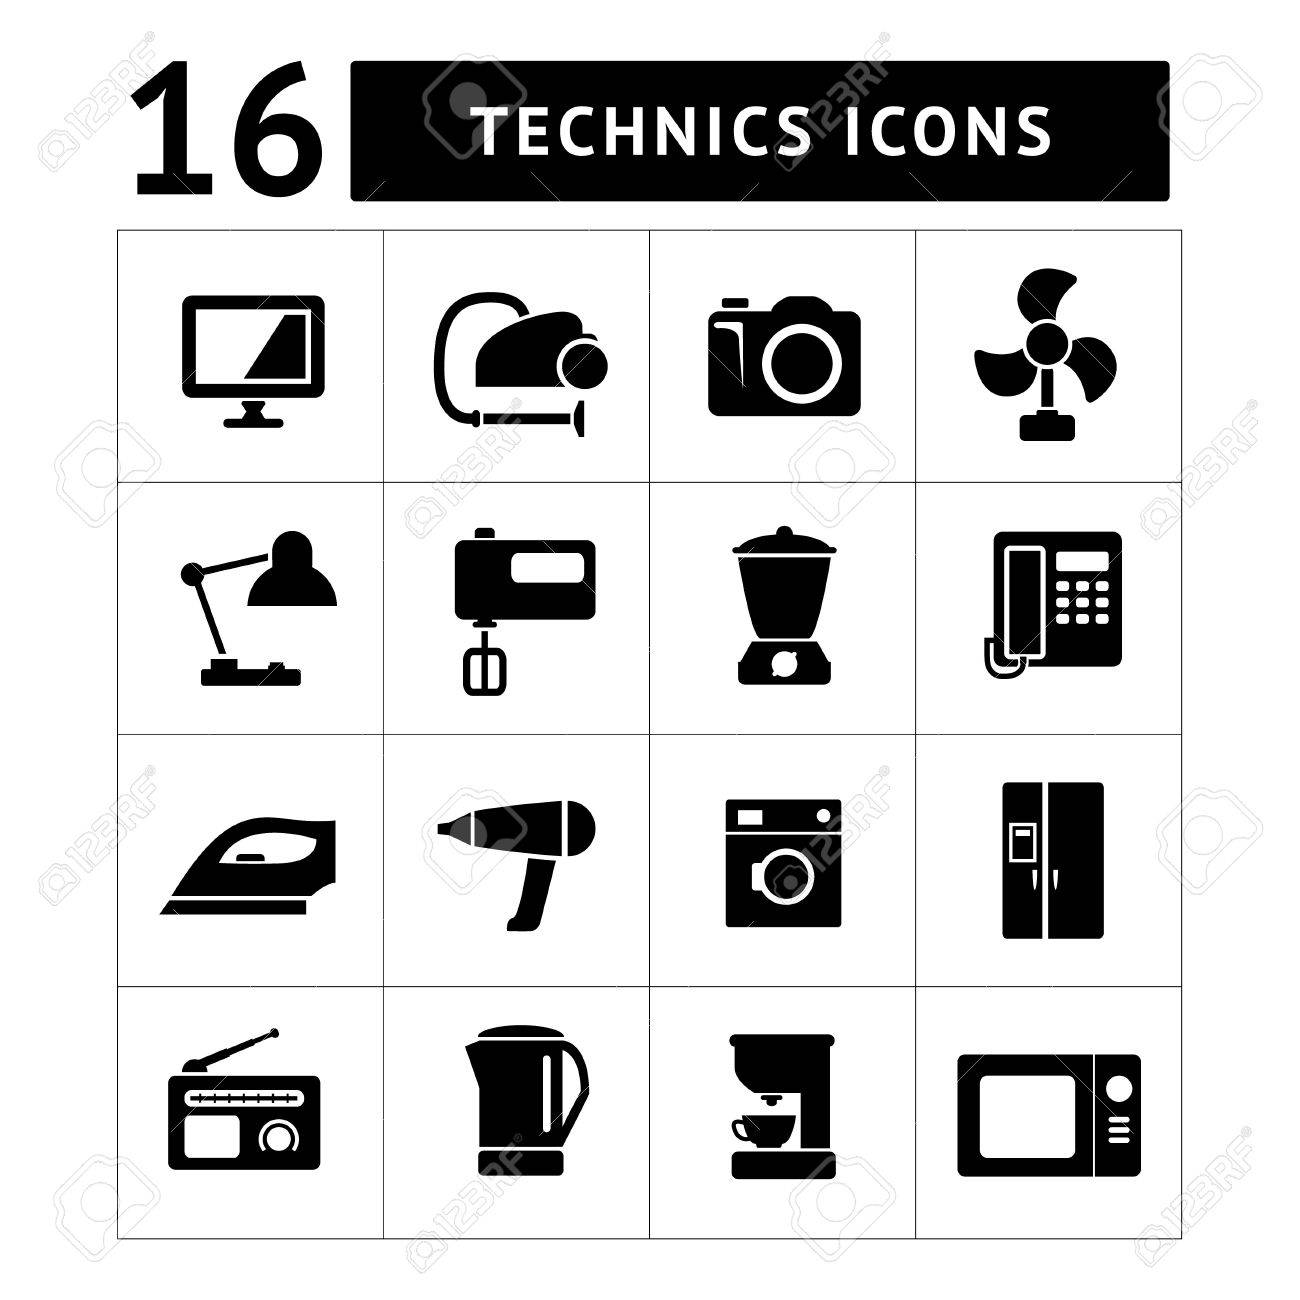 technics : Set icons of home